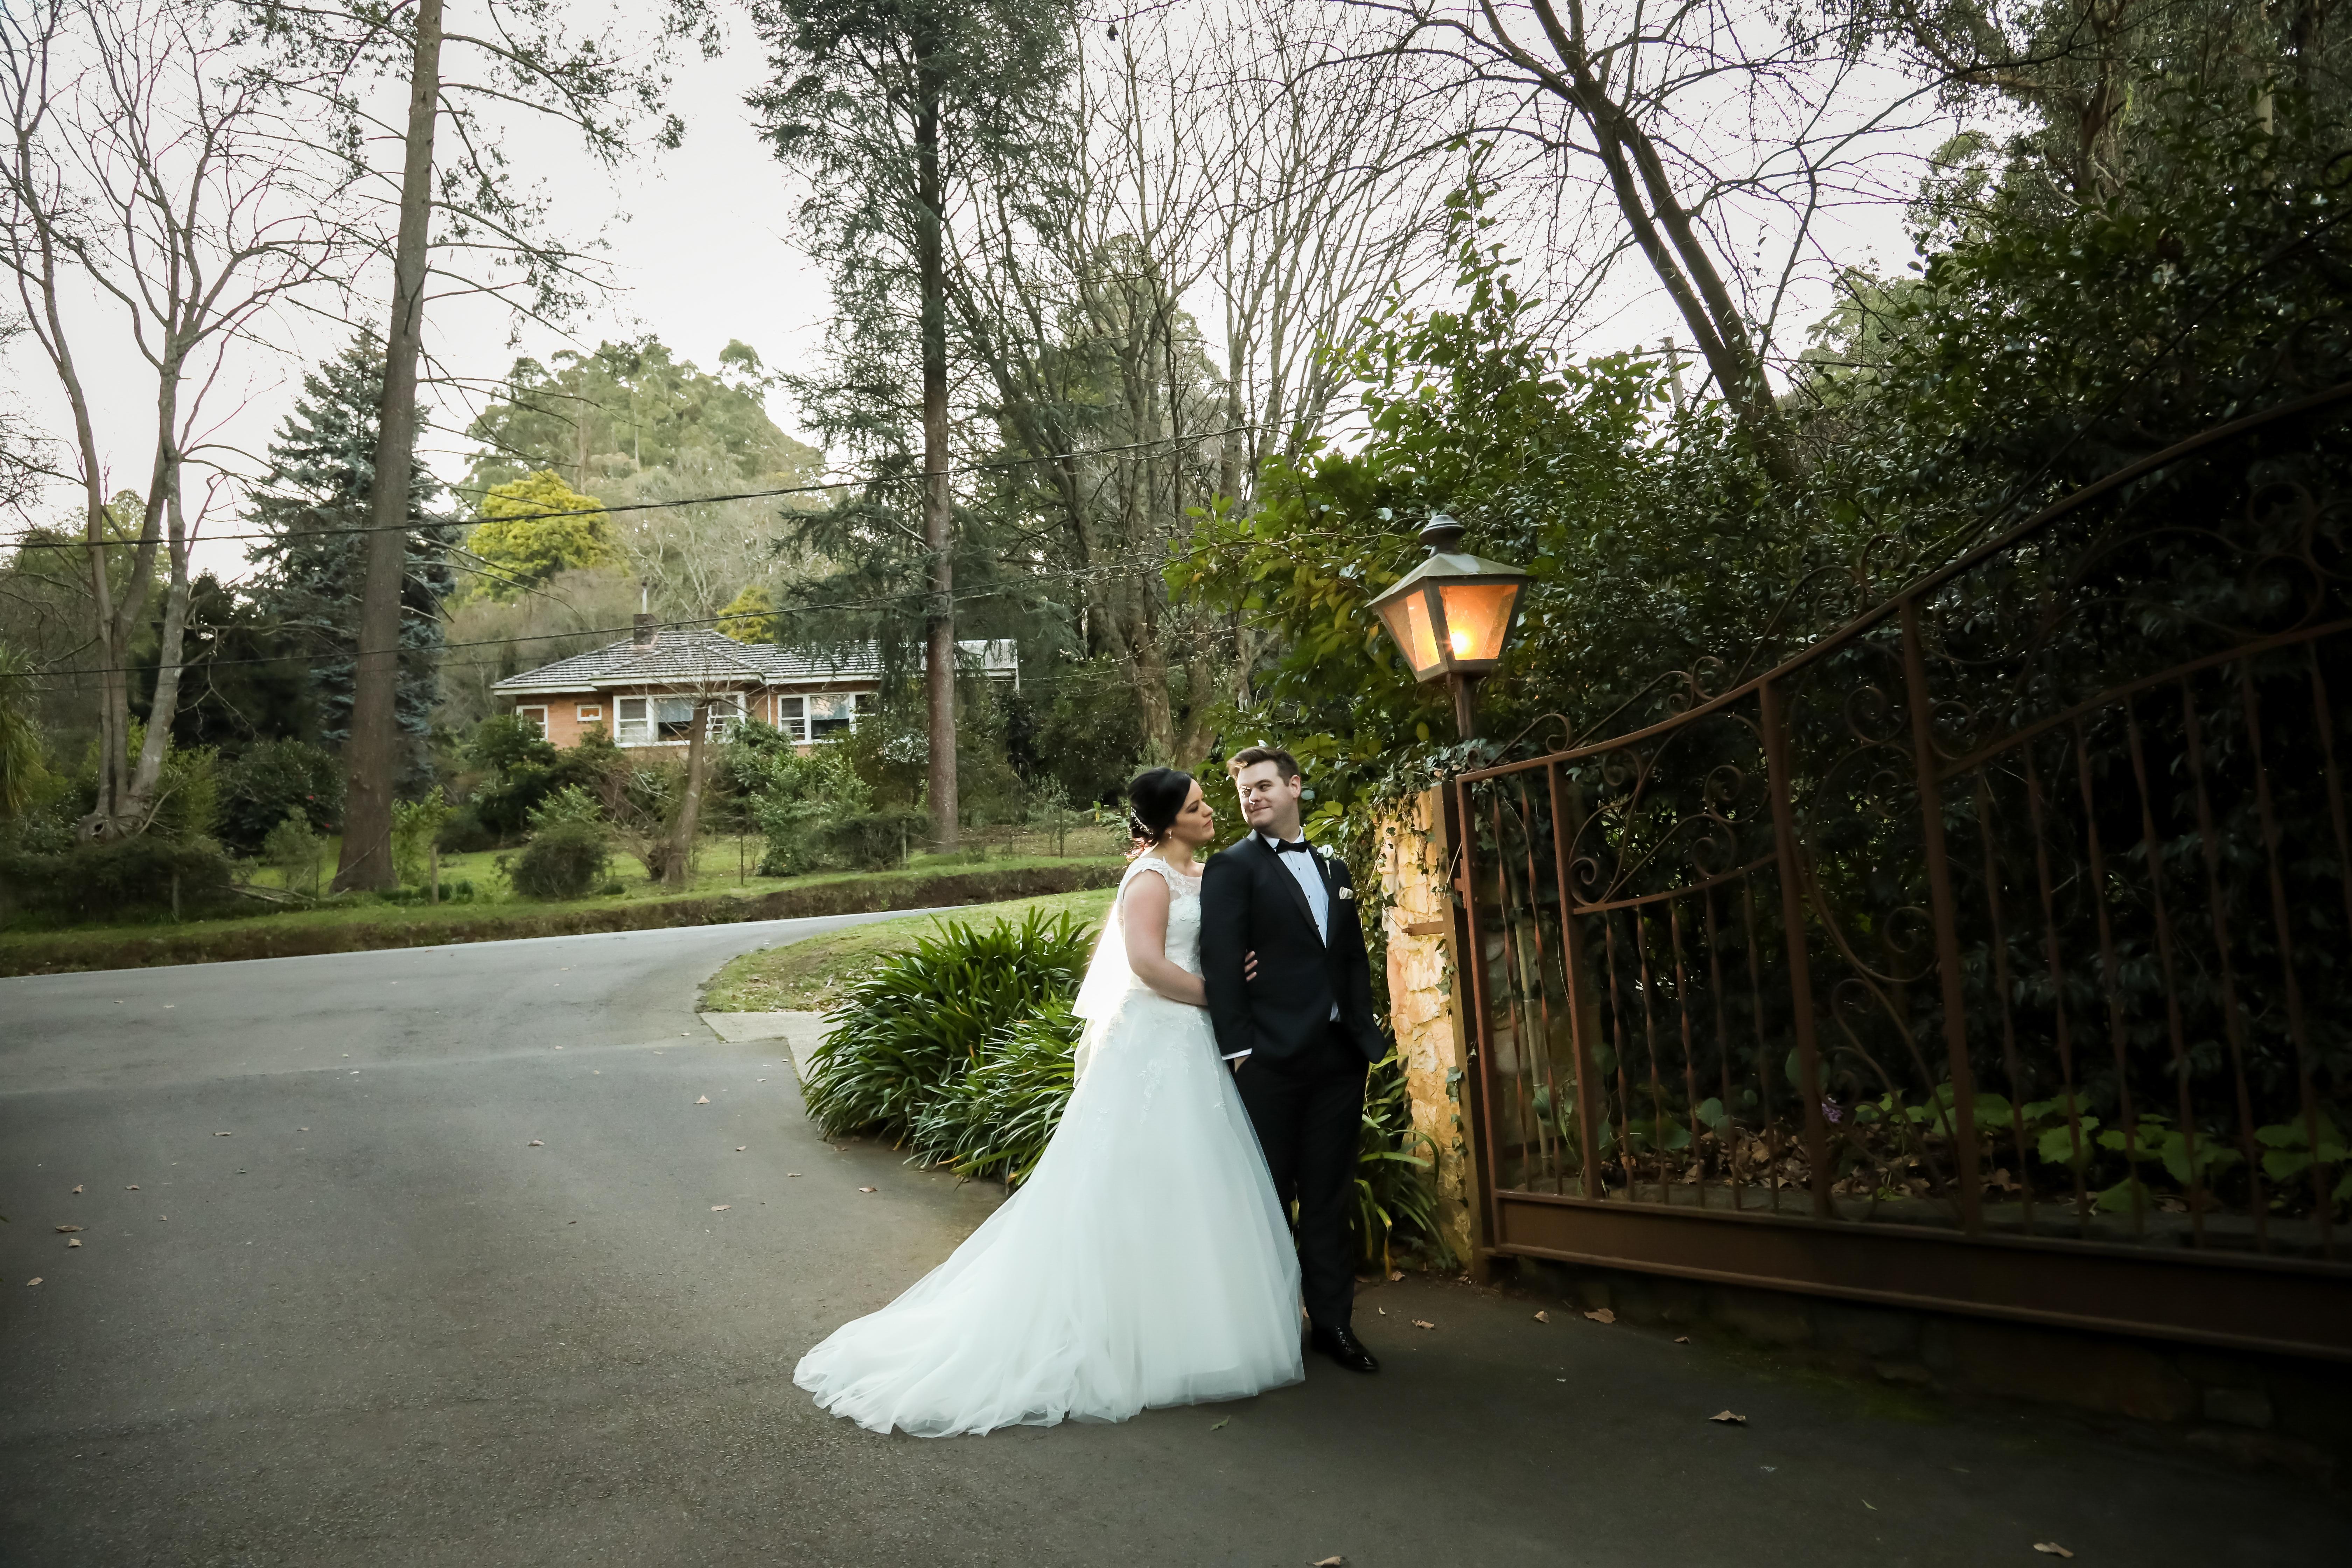 Wedding dress customisations